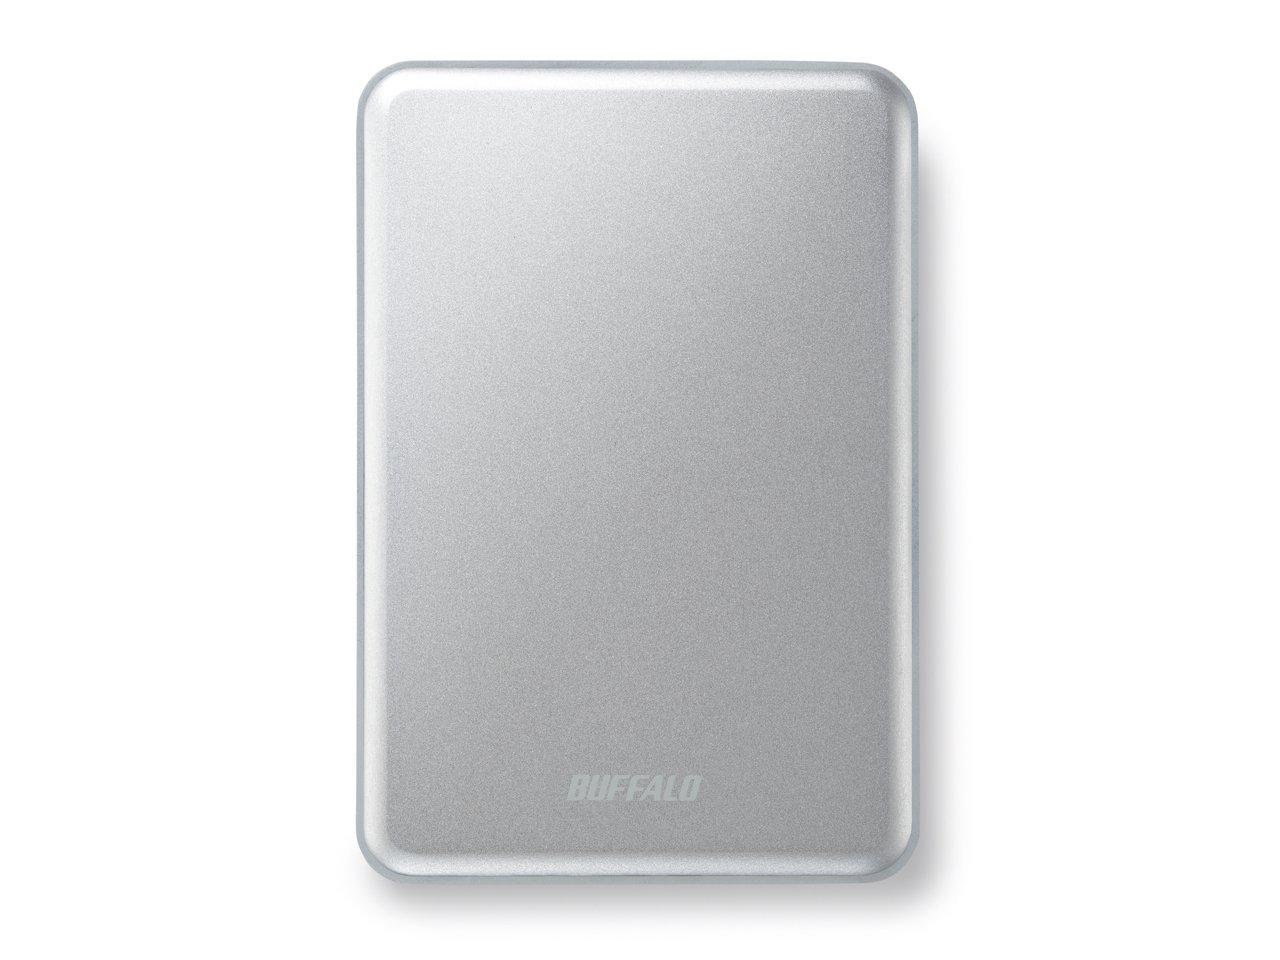 BUFFALO 1 TiB ministation SLIM USB ổ cứng – black-parent 3.0 inch 8.8 mm